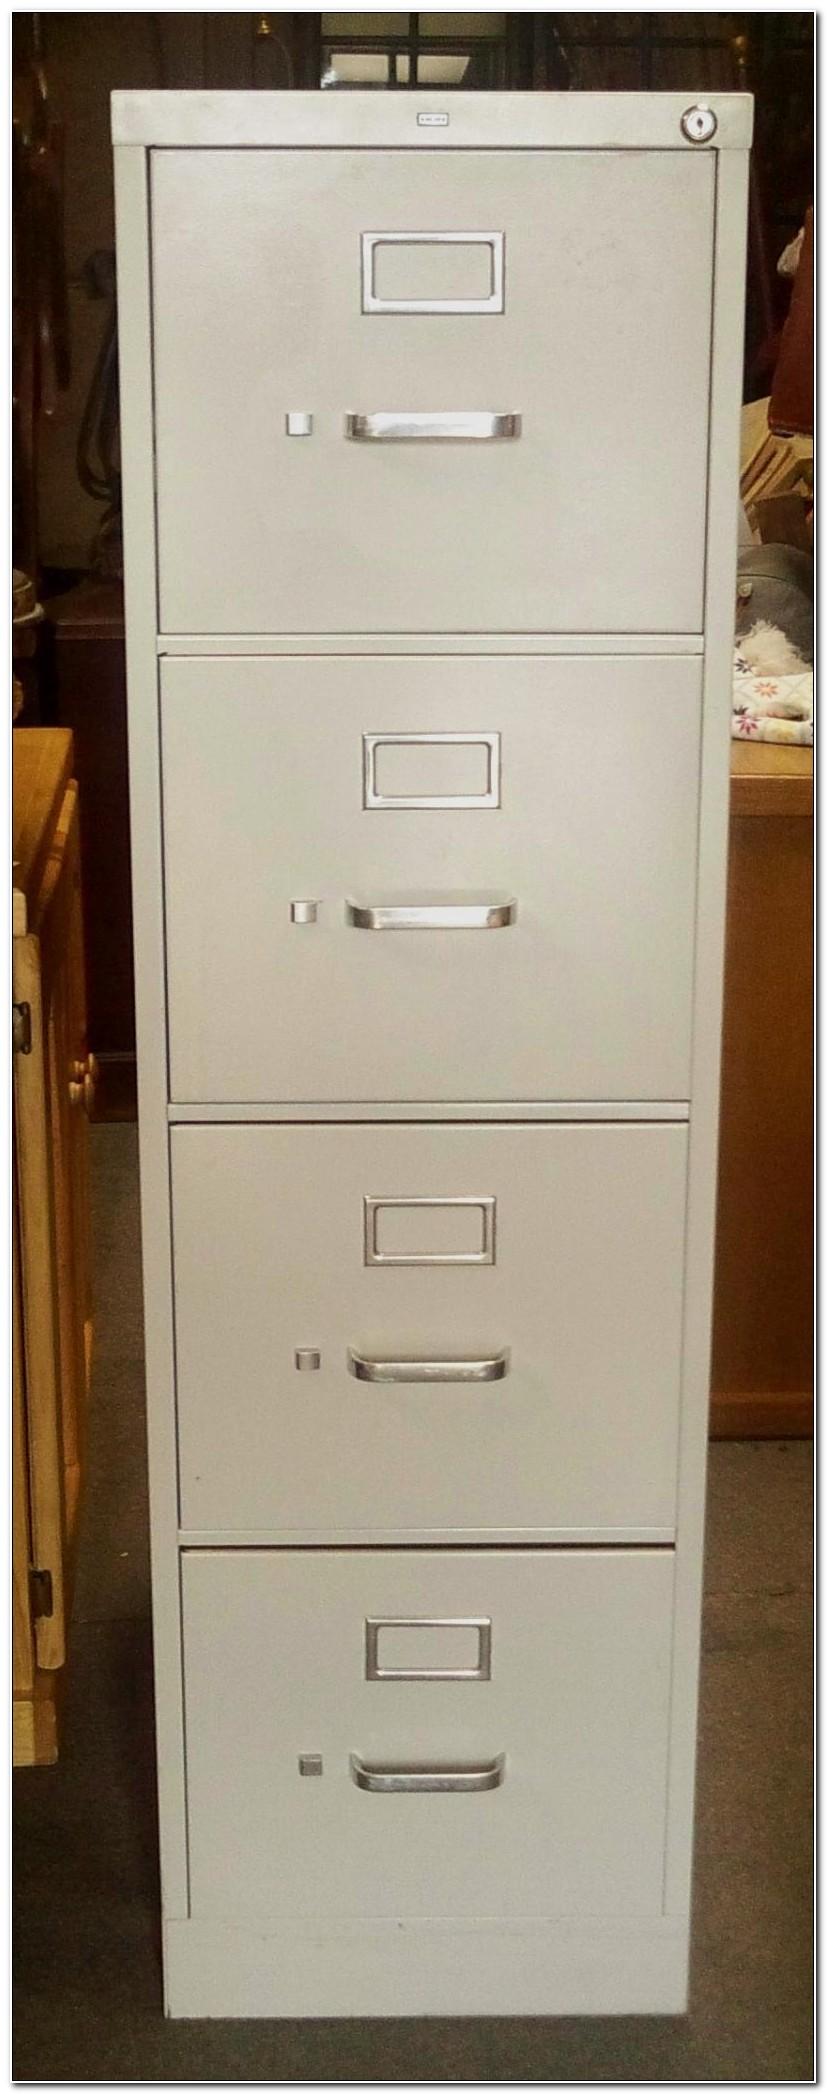 Hon 2 Drawer File Cabinet Used